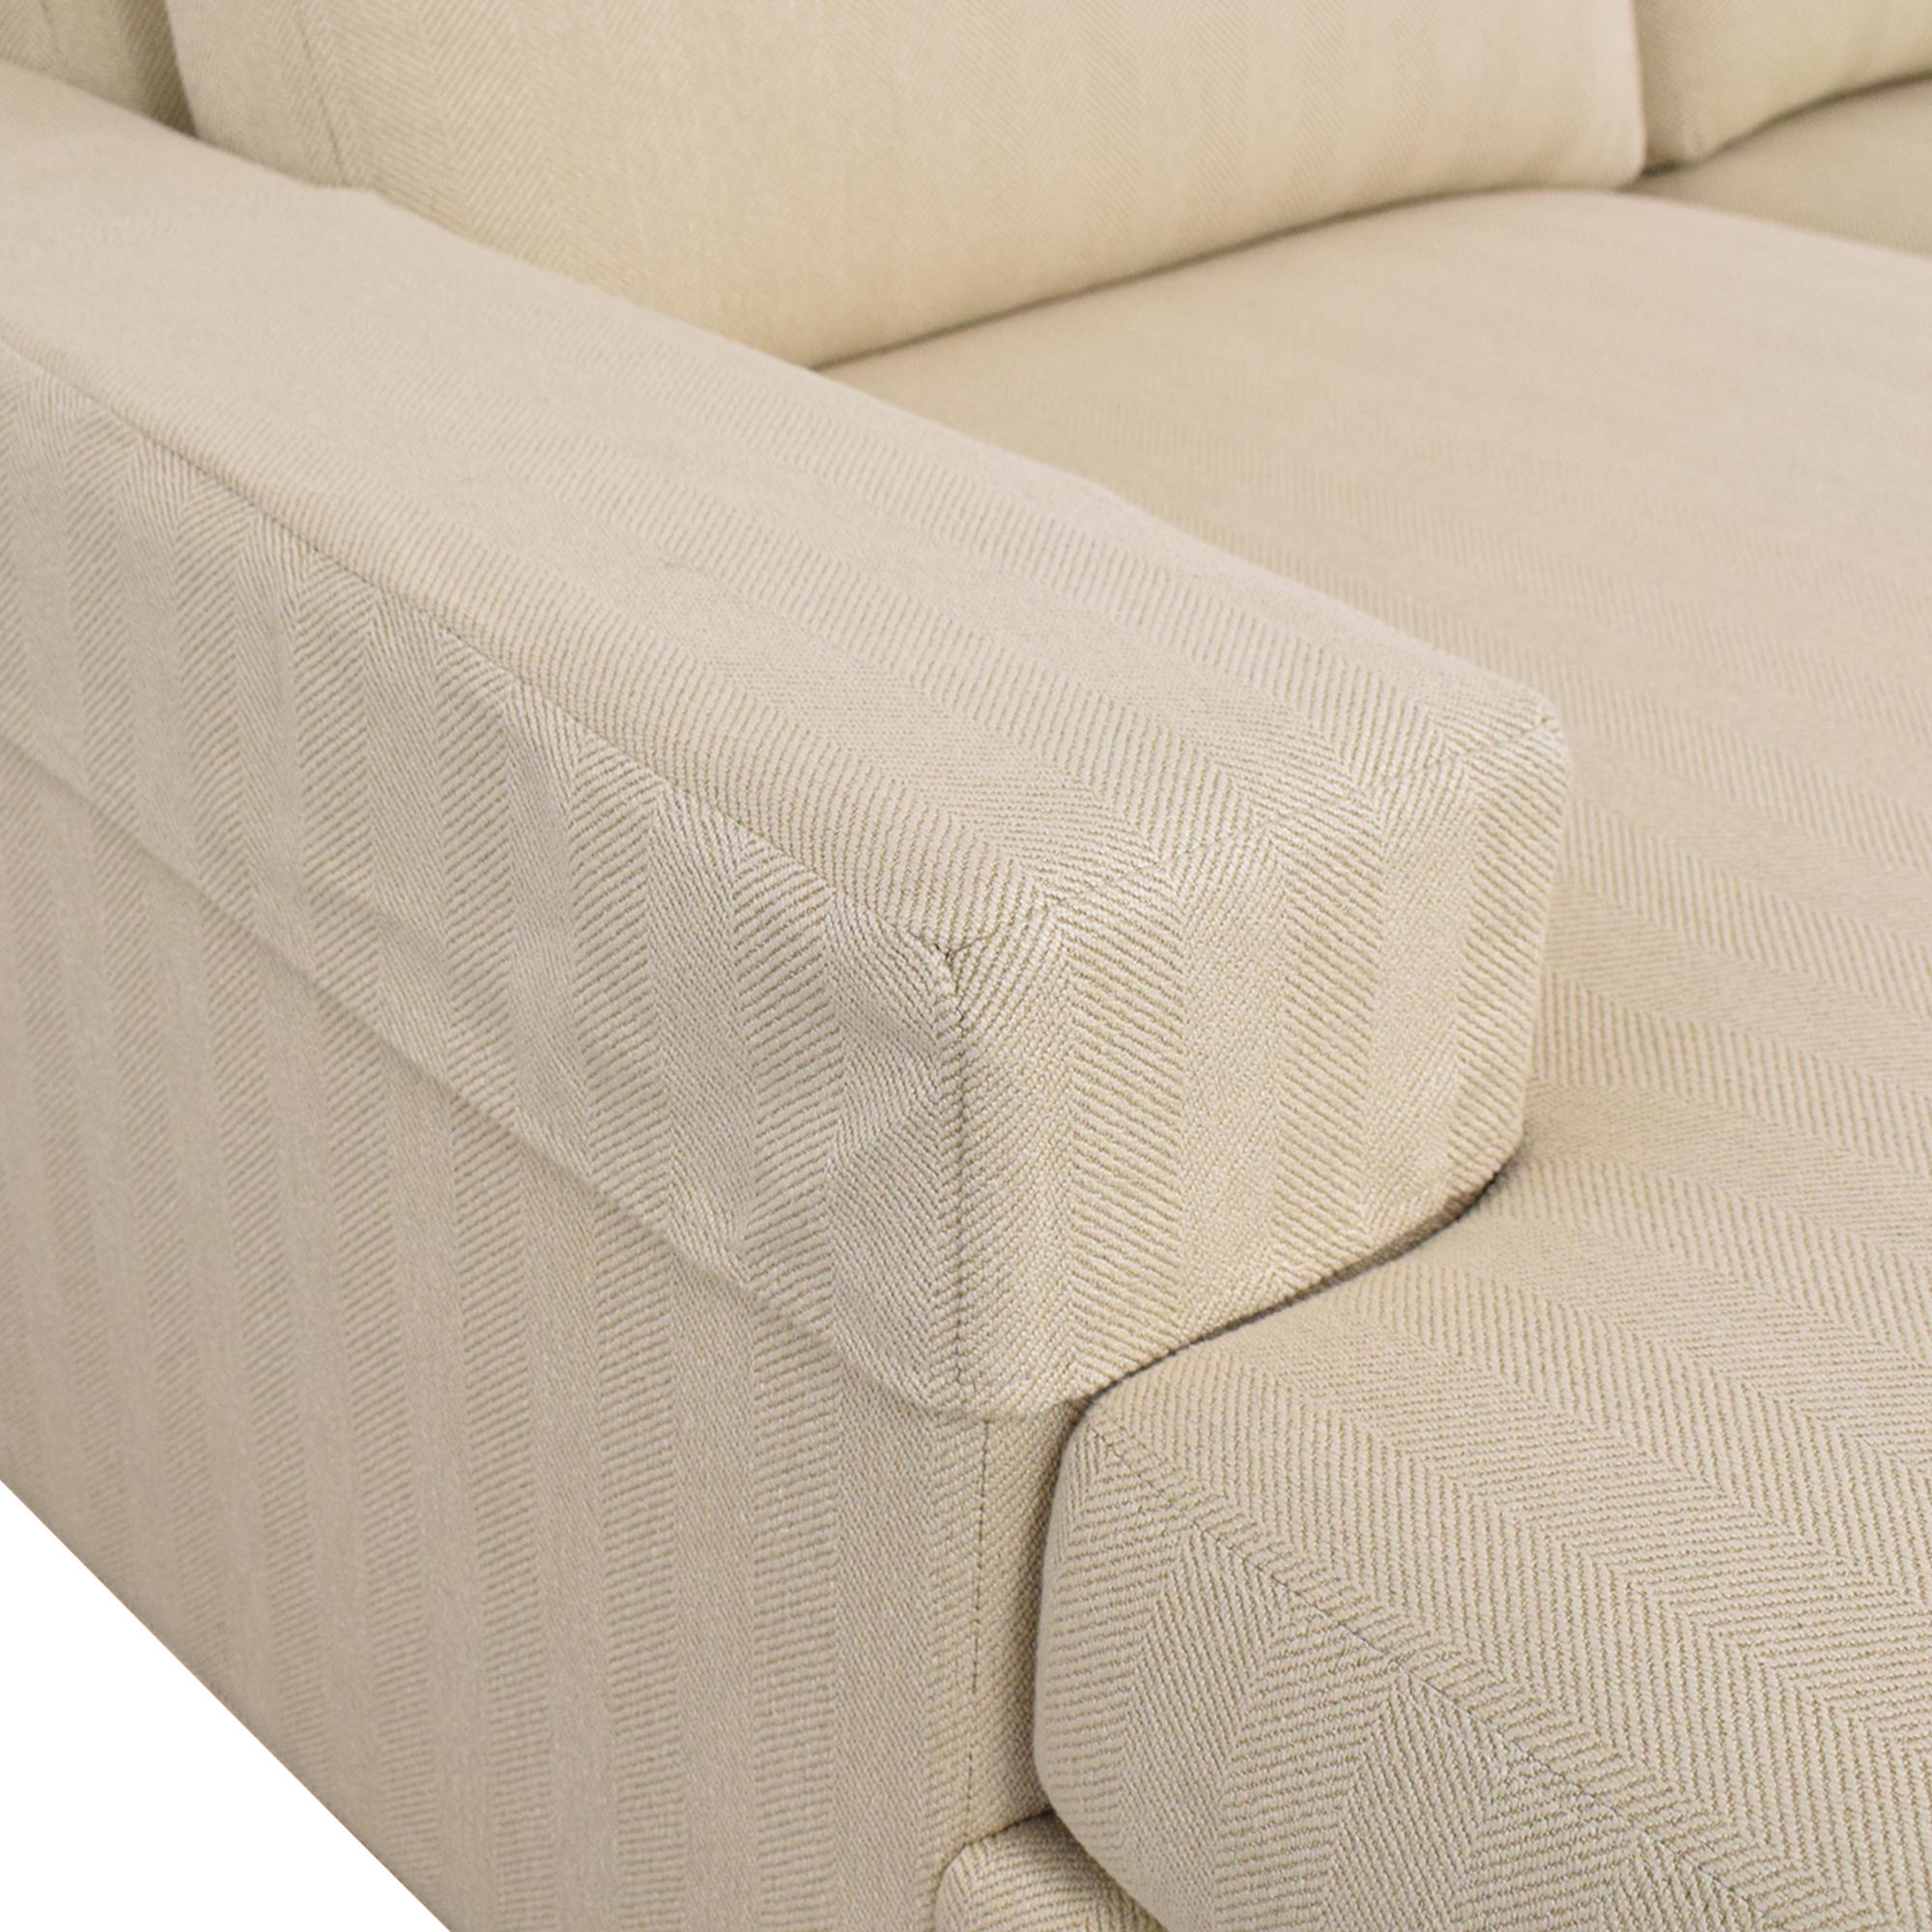 Ethan Allen Ethan Allen Conway Sectional Sofa beige